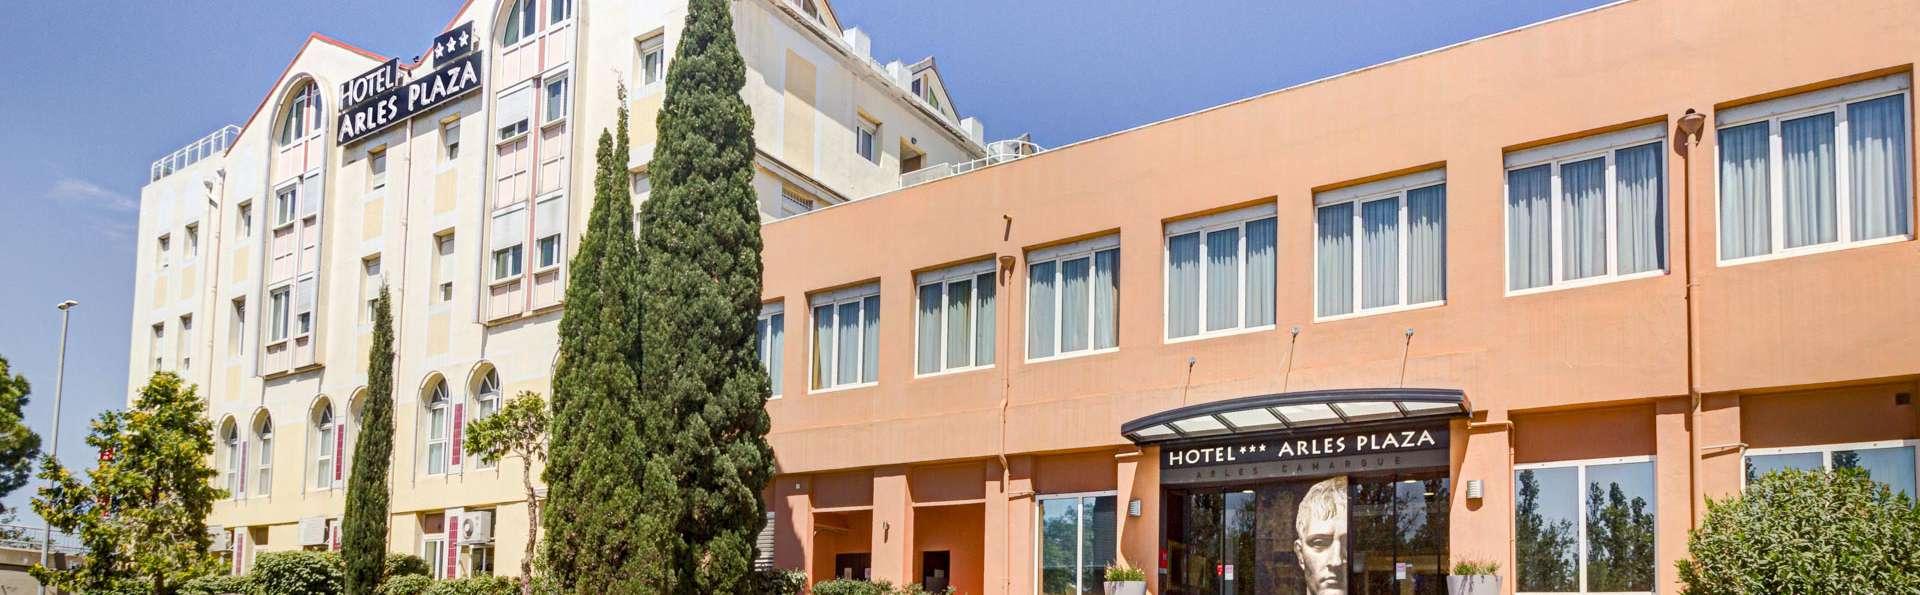 Hôtel Arles Plaza - EDIT_FRONT_02.jpg